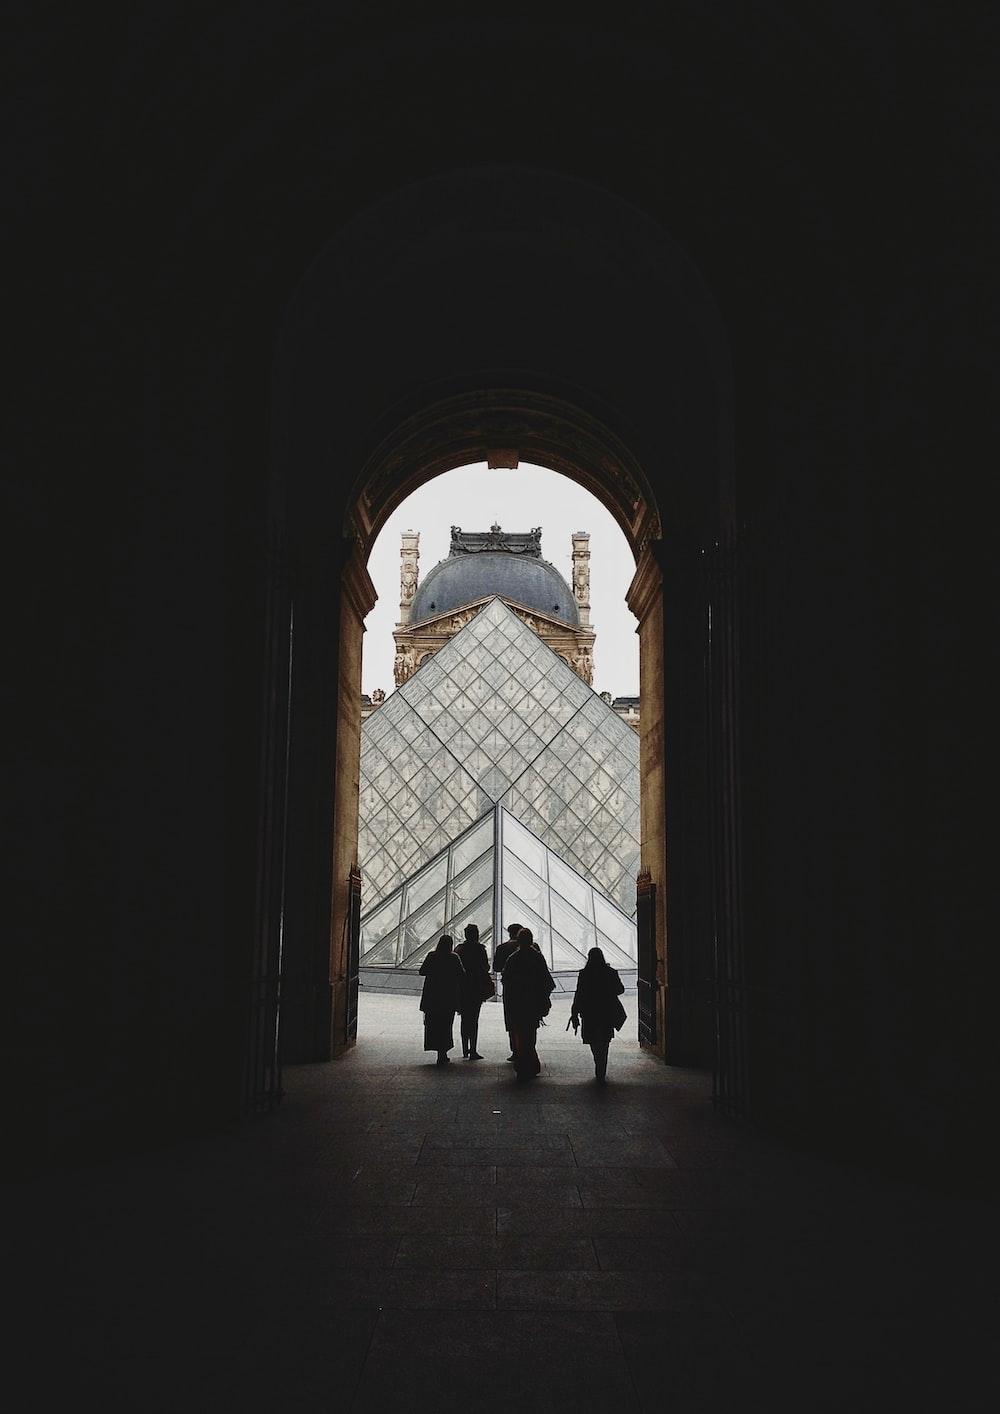 silhouette of people walking out of door